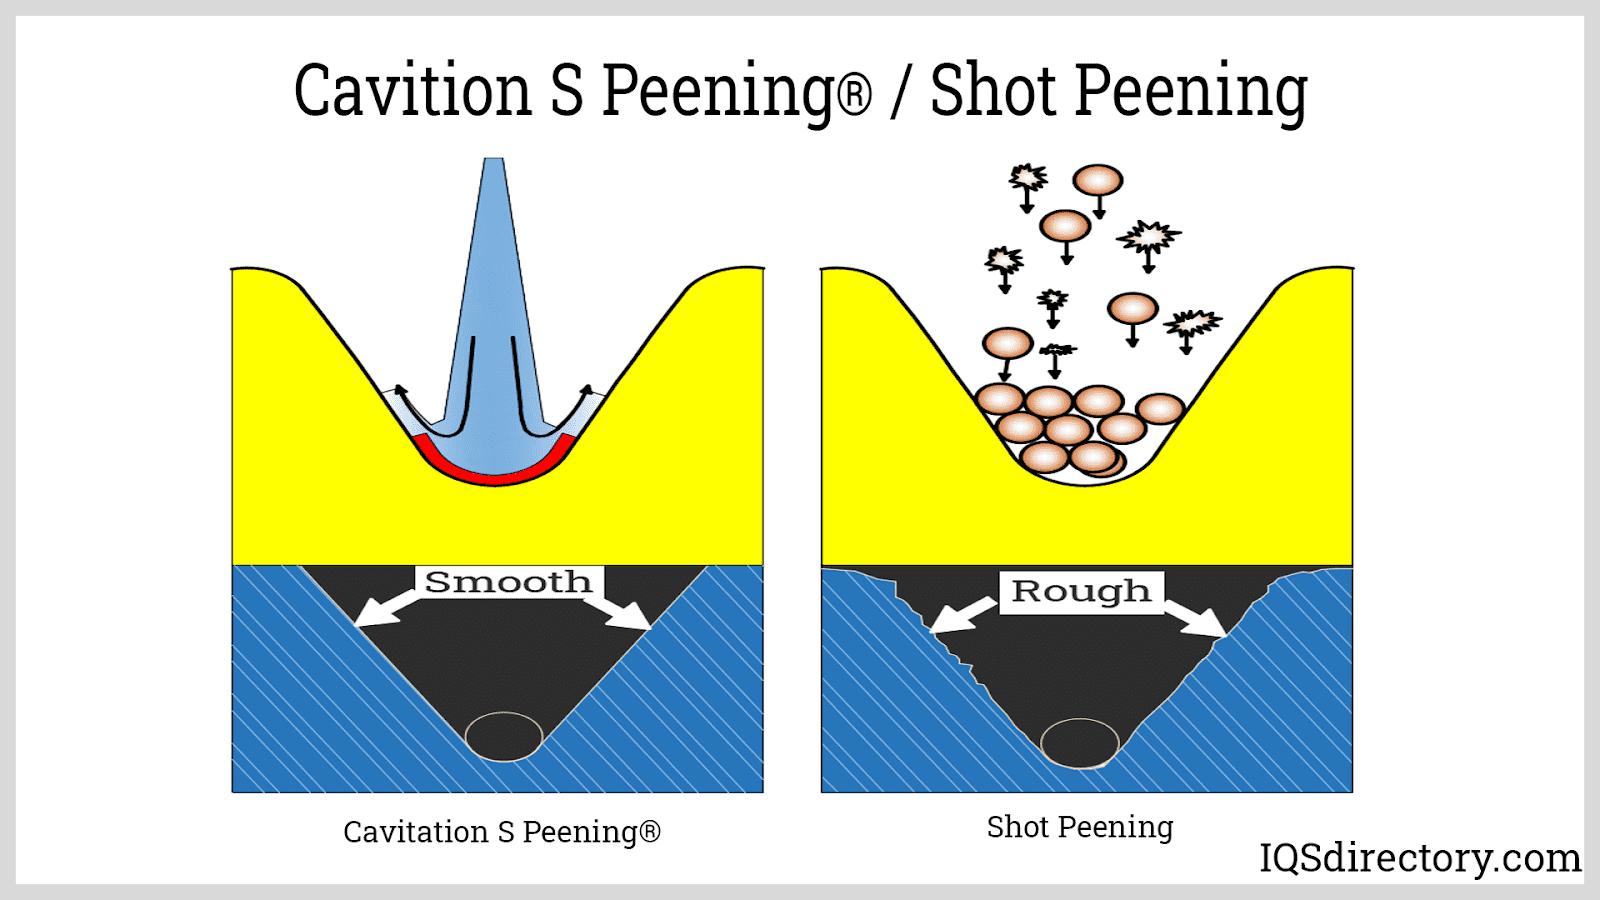 Cavition S Peening / Shot Peening